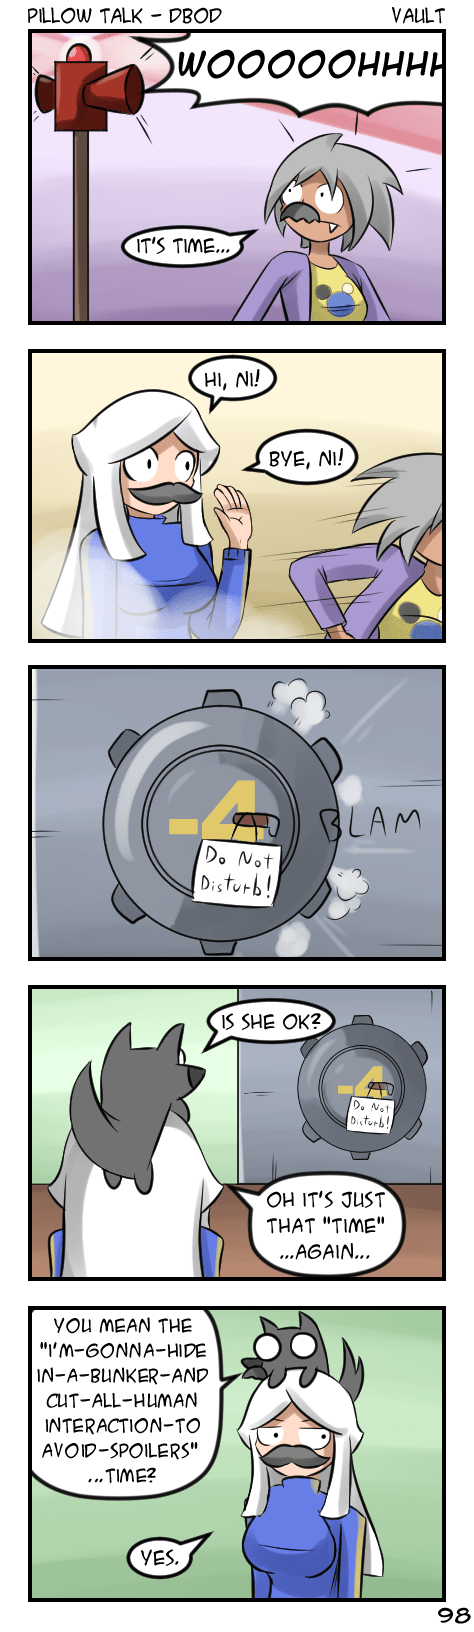 fallout 4,leaks,web comics